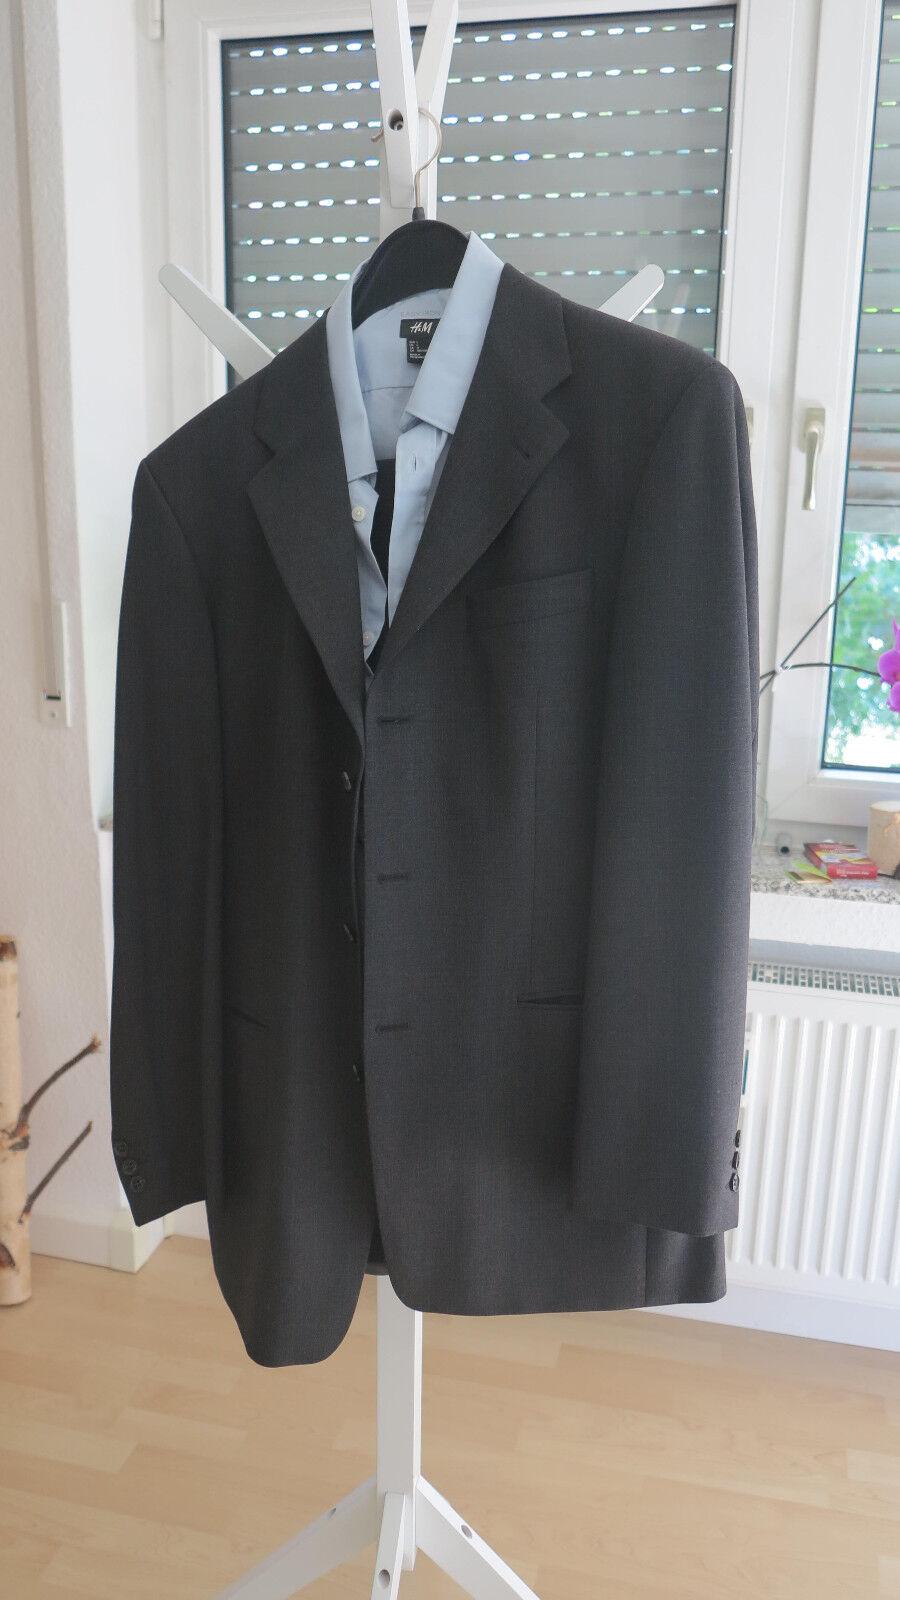 Herren-Anzug (jacke & Hose), inkl. Hemd, kaum getragen - anthrazit